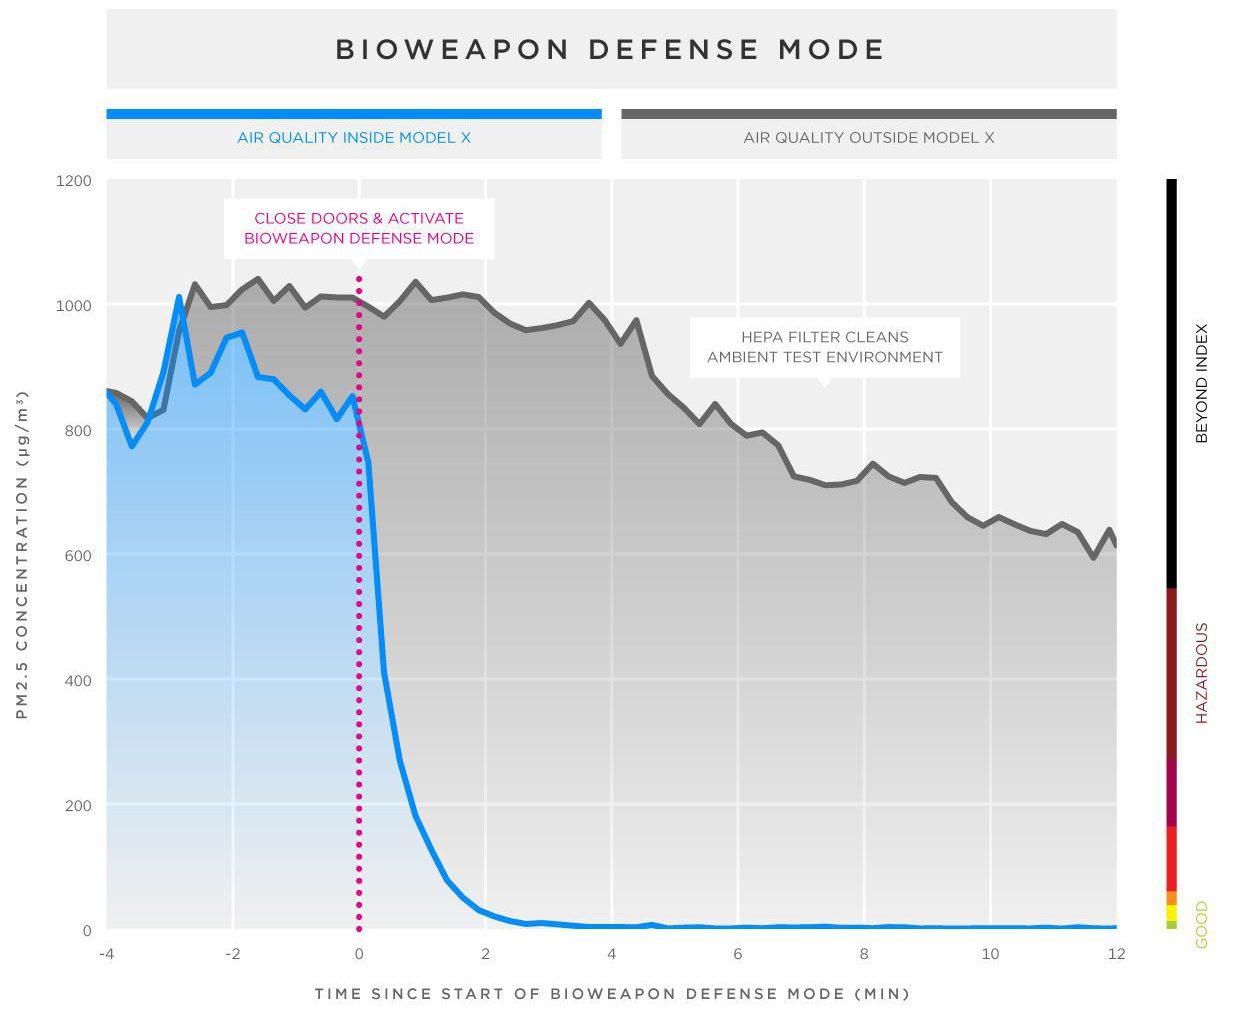 biohazard-linegraph